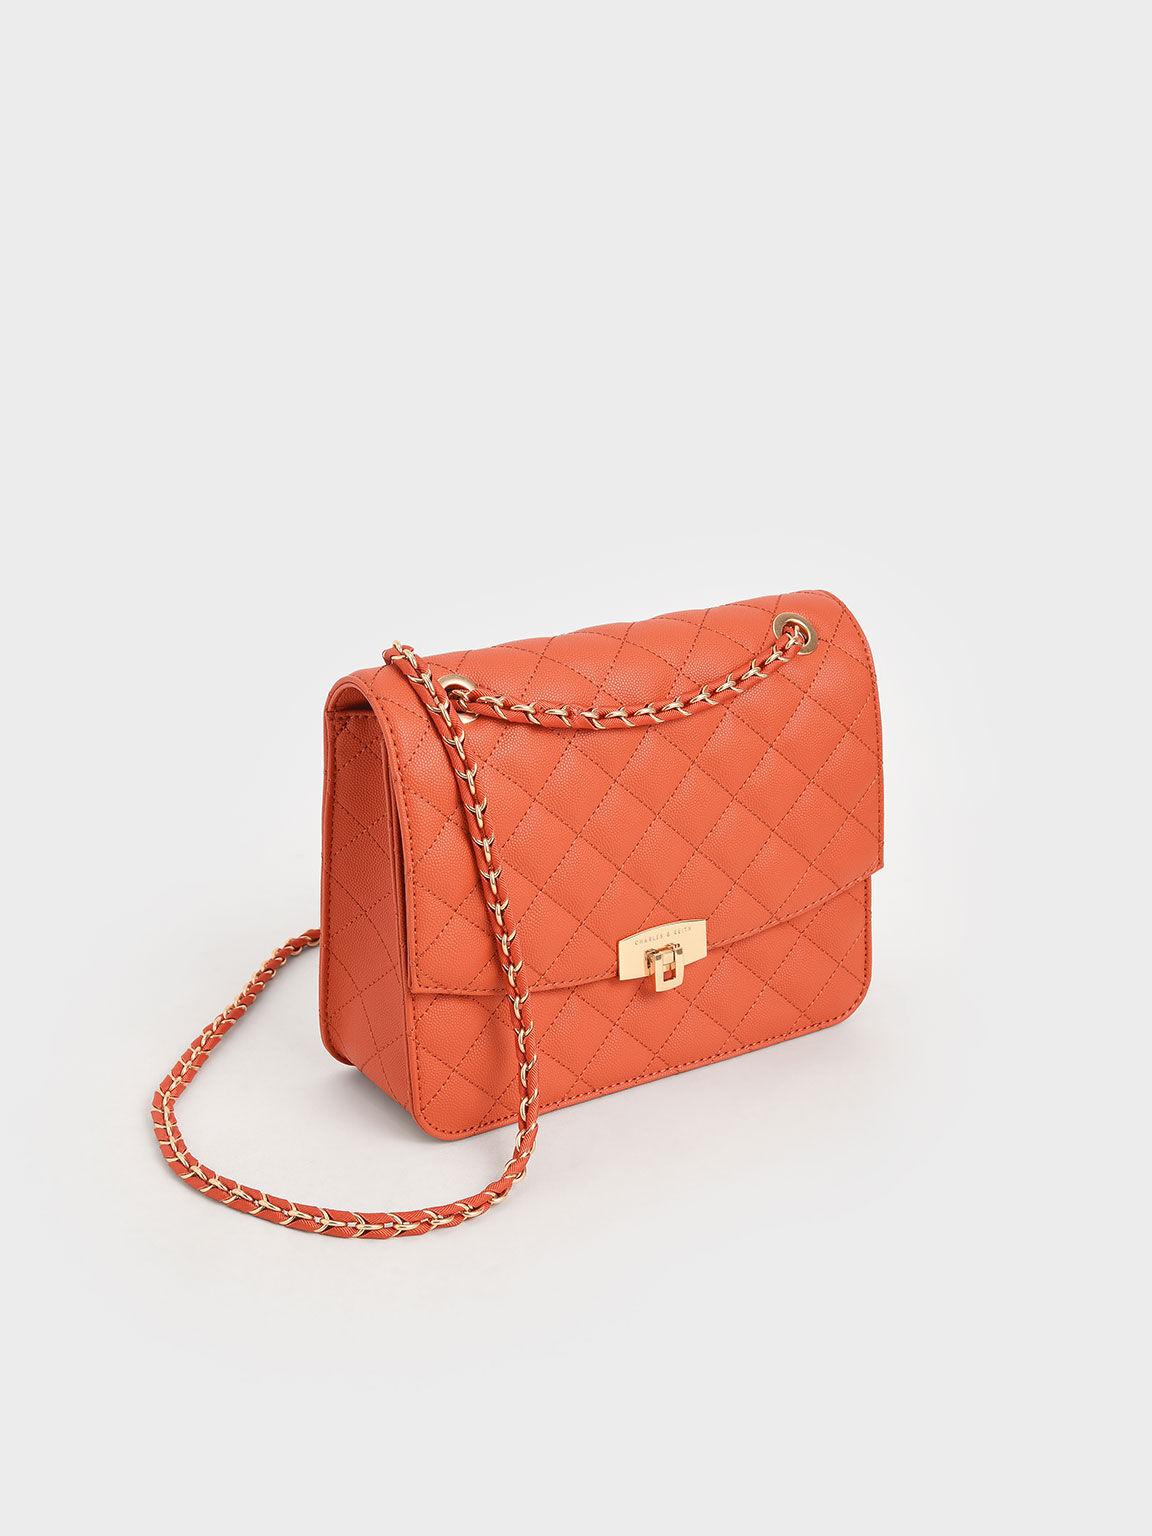 菱格紋鍊條包, 橘色, hi-res